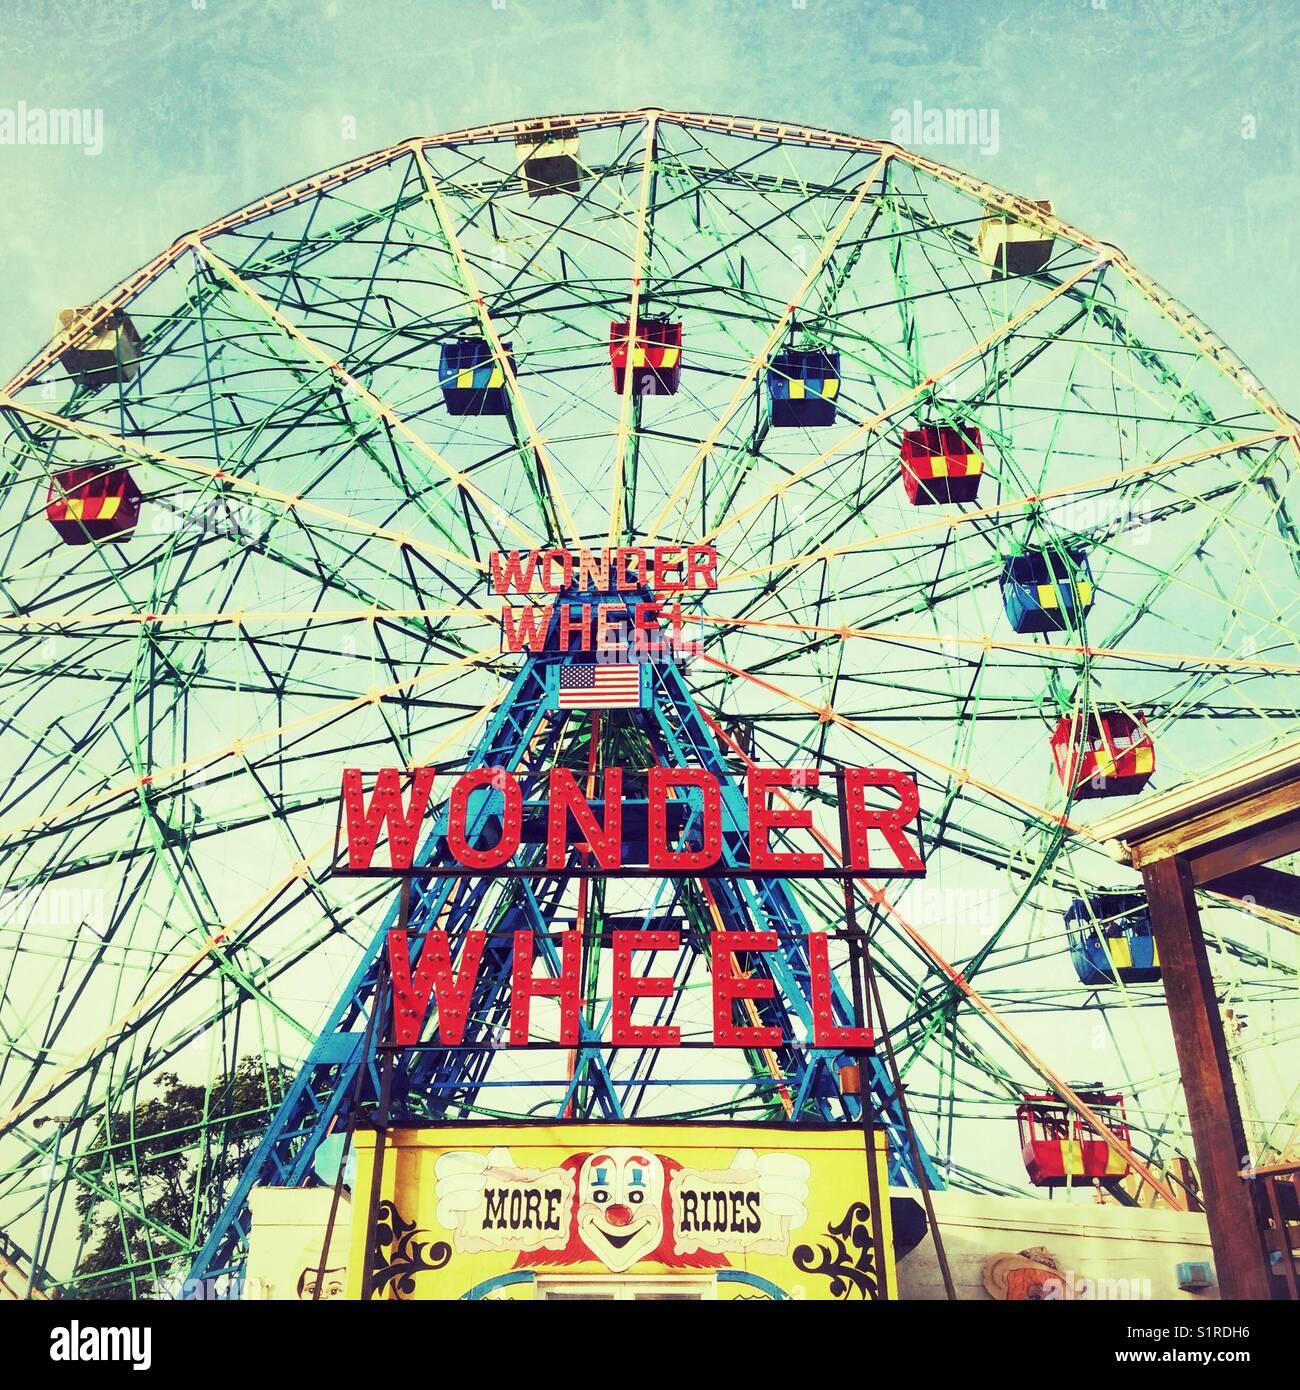 Deno's wonder wheel, Coney Island, Brooklyn, New York, United States of America. - Stock Image